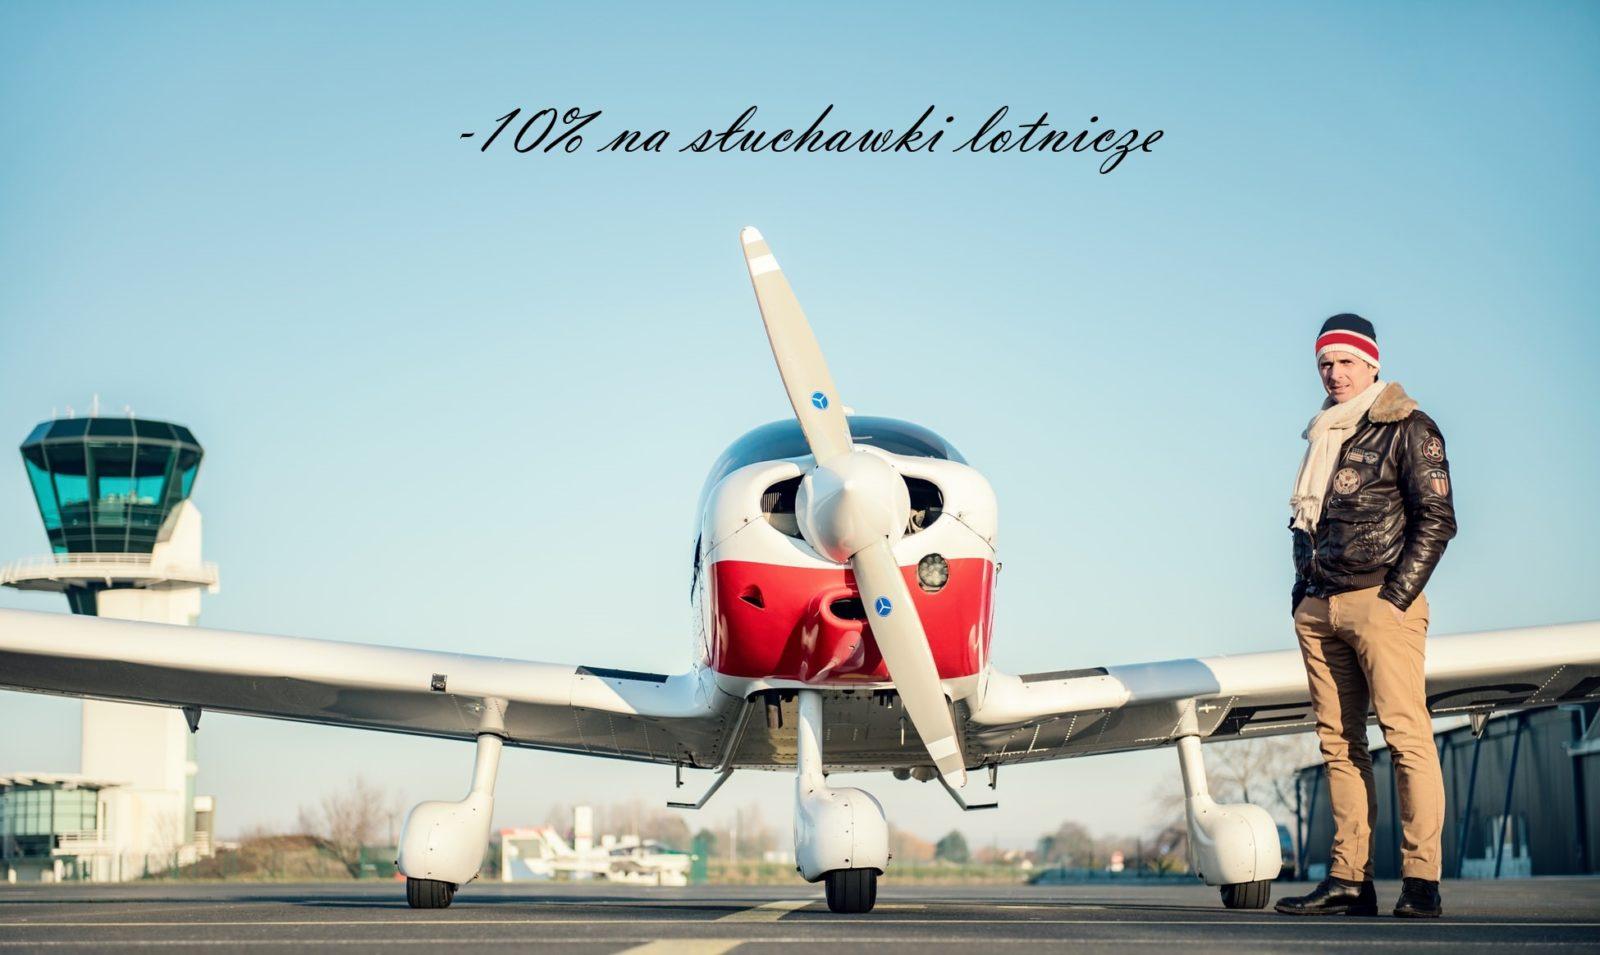 rabat promocja na sluchawki lotnicze